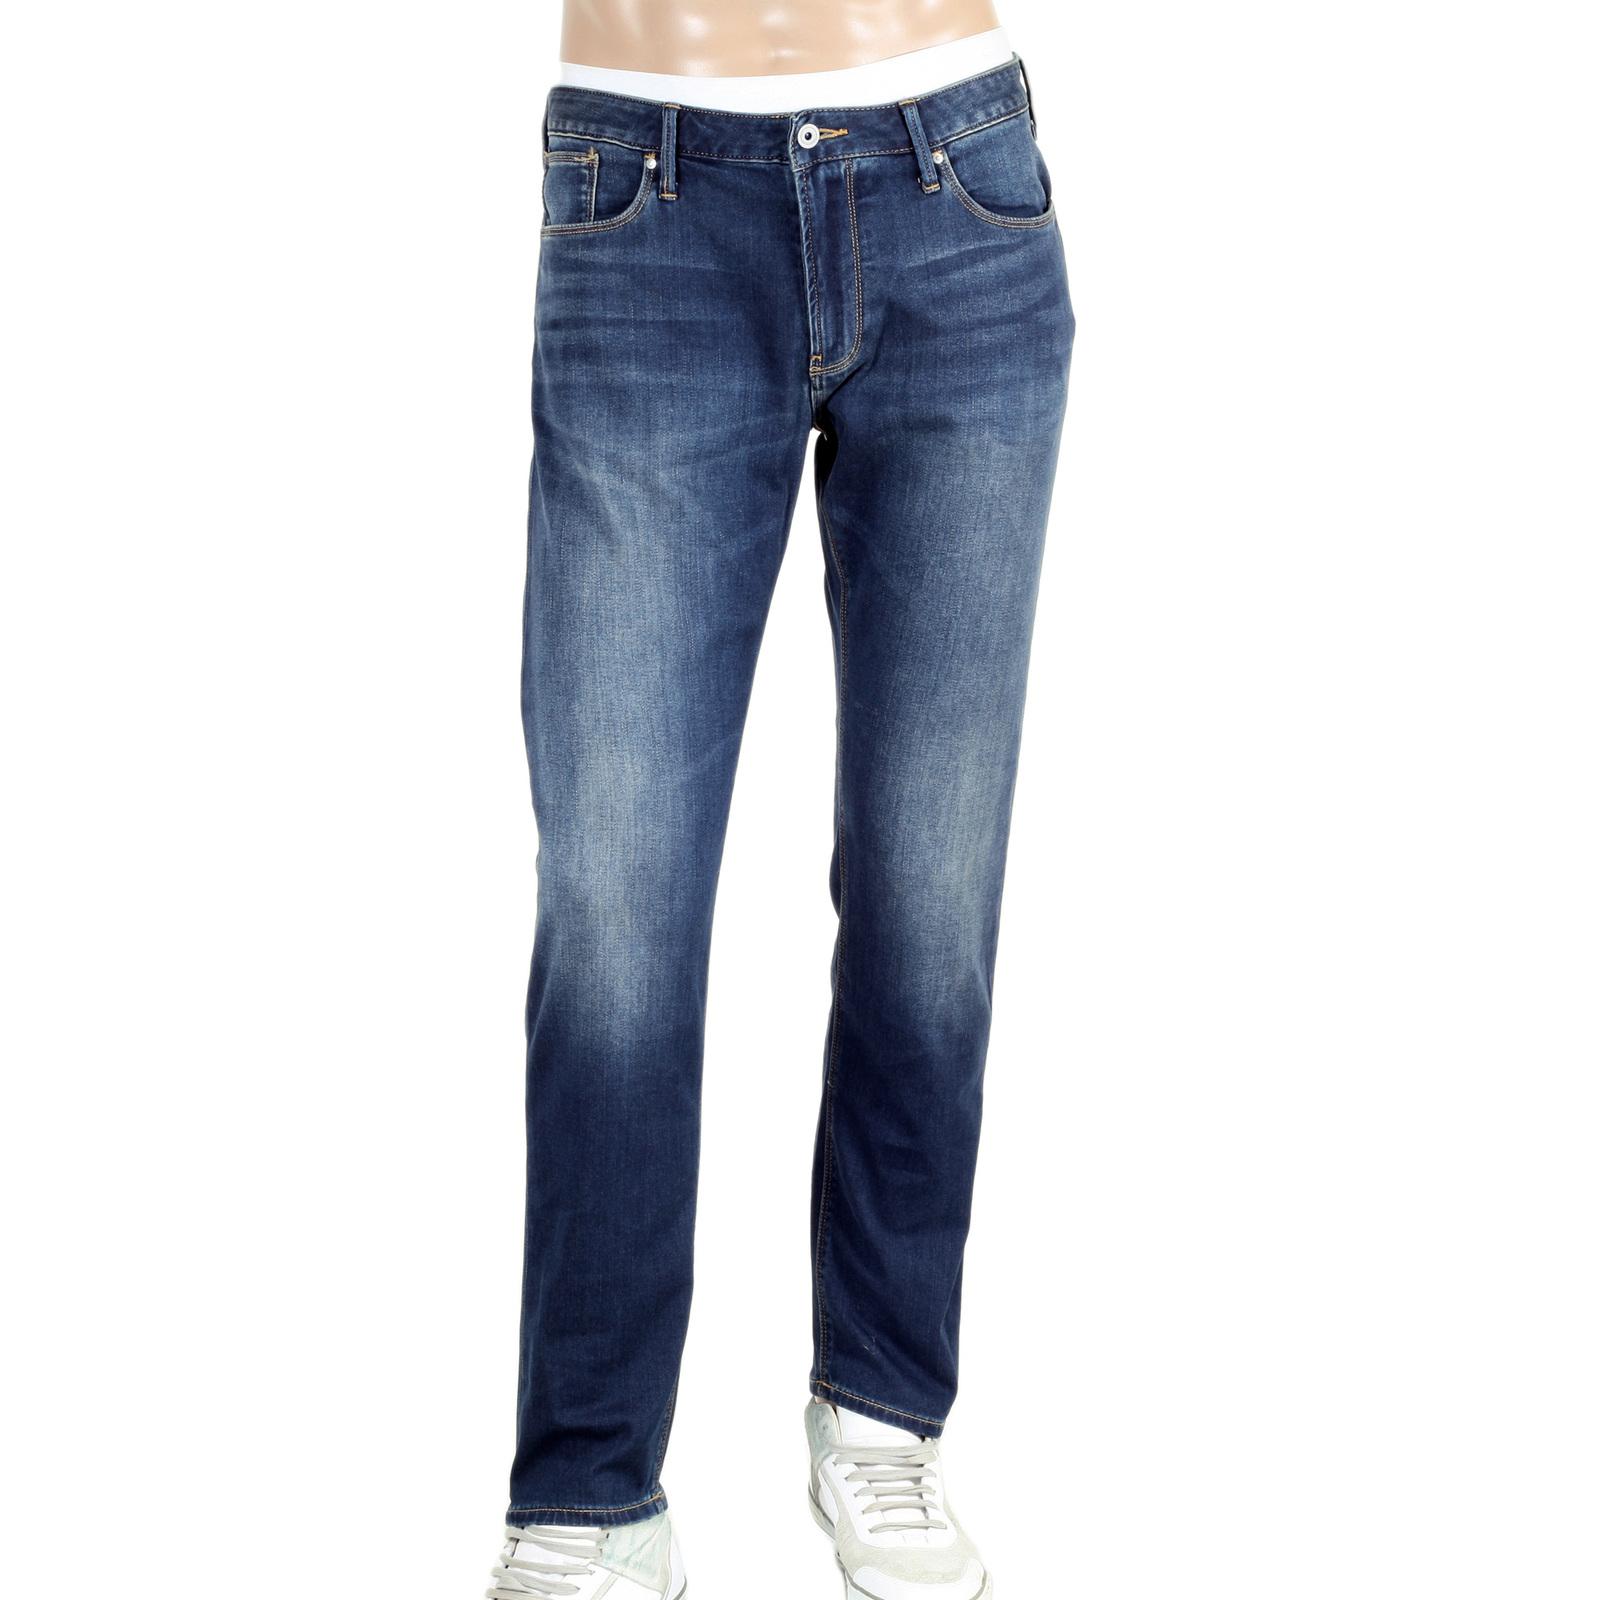 Black Slim Fit Mens Jeans